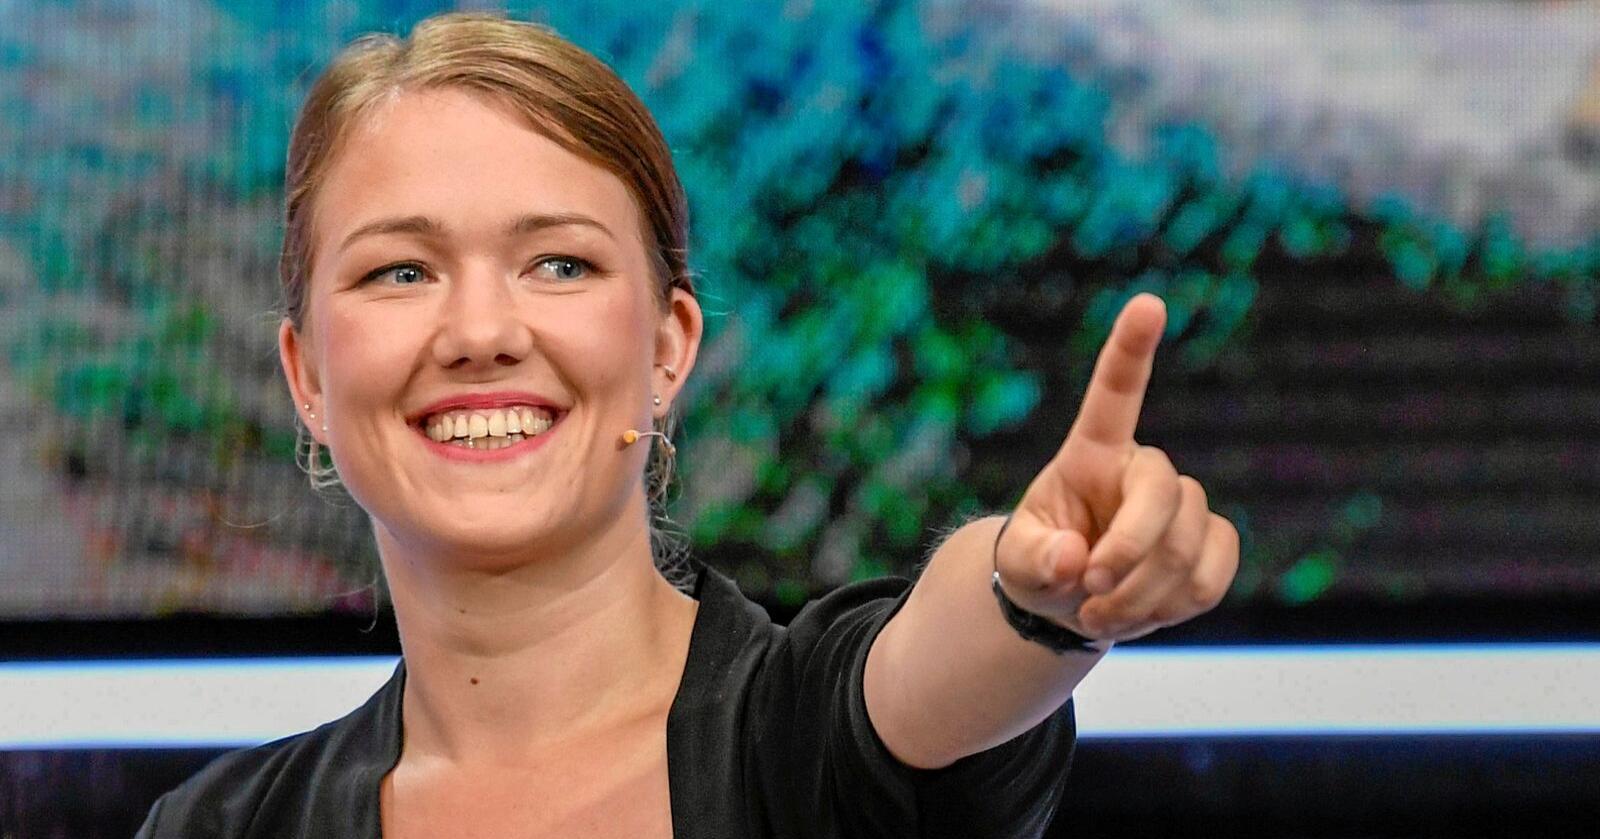 Une Aina Bastholm, nasjonal talsperson og stortingsrepresentant for Miljøpartiet dei Grøne. Foto: Marit Hommedal/NTB scanpix